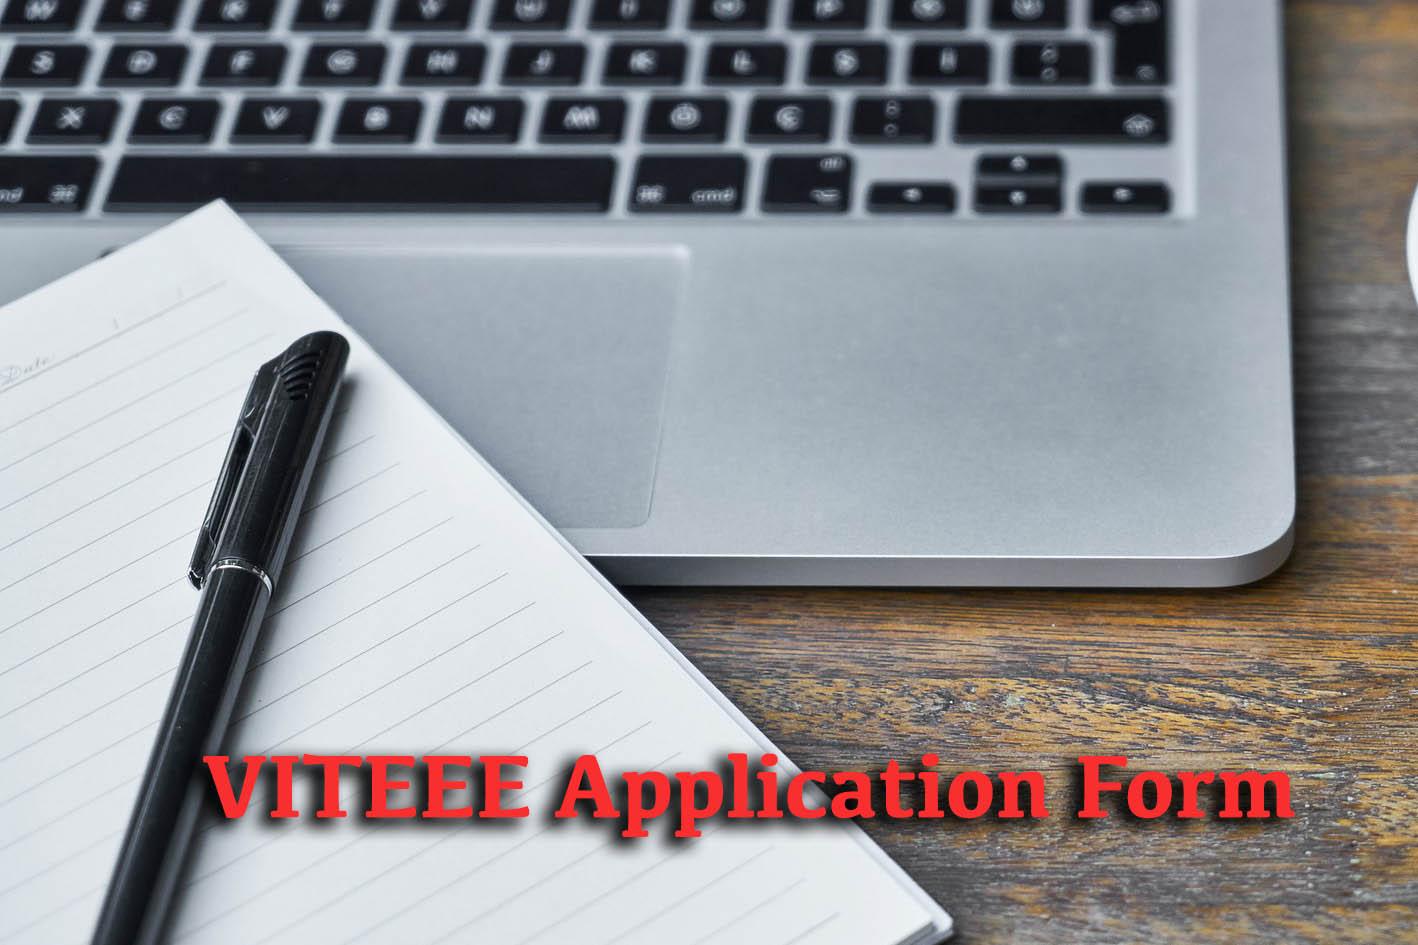 VITEEE Application Form